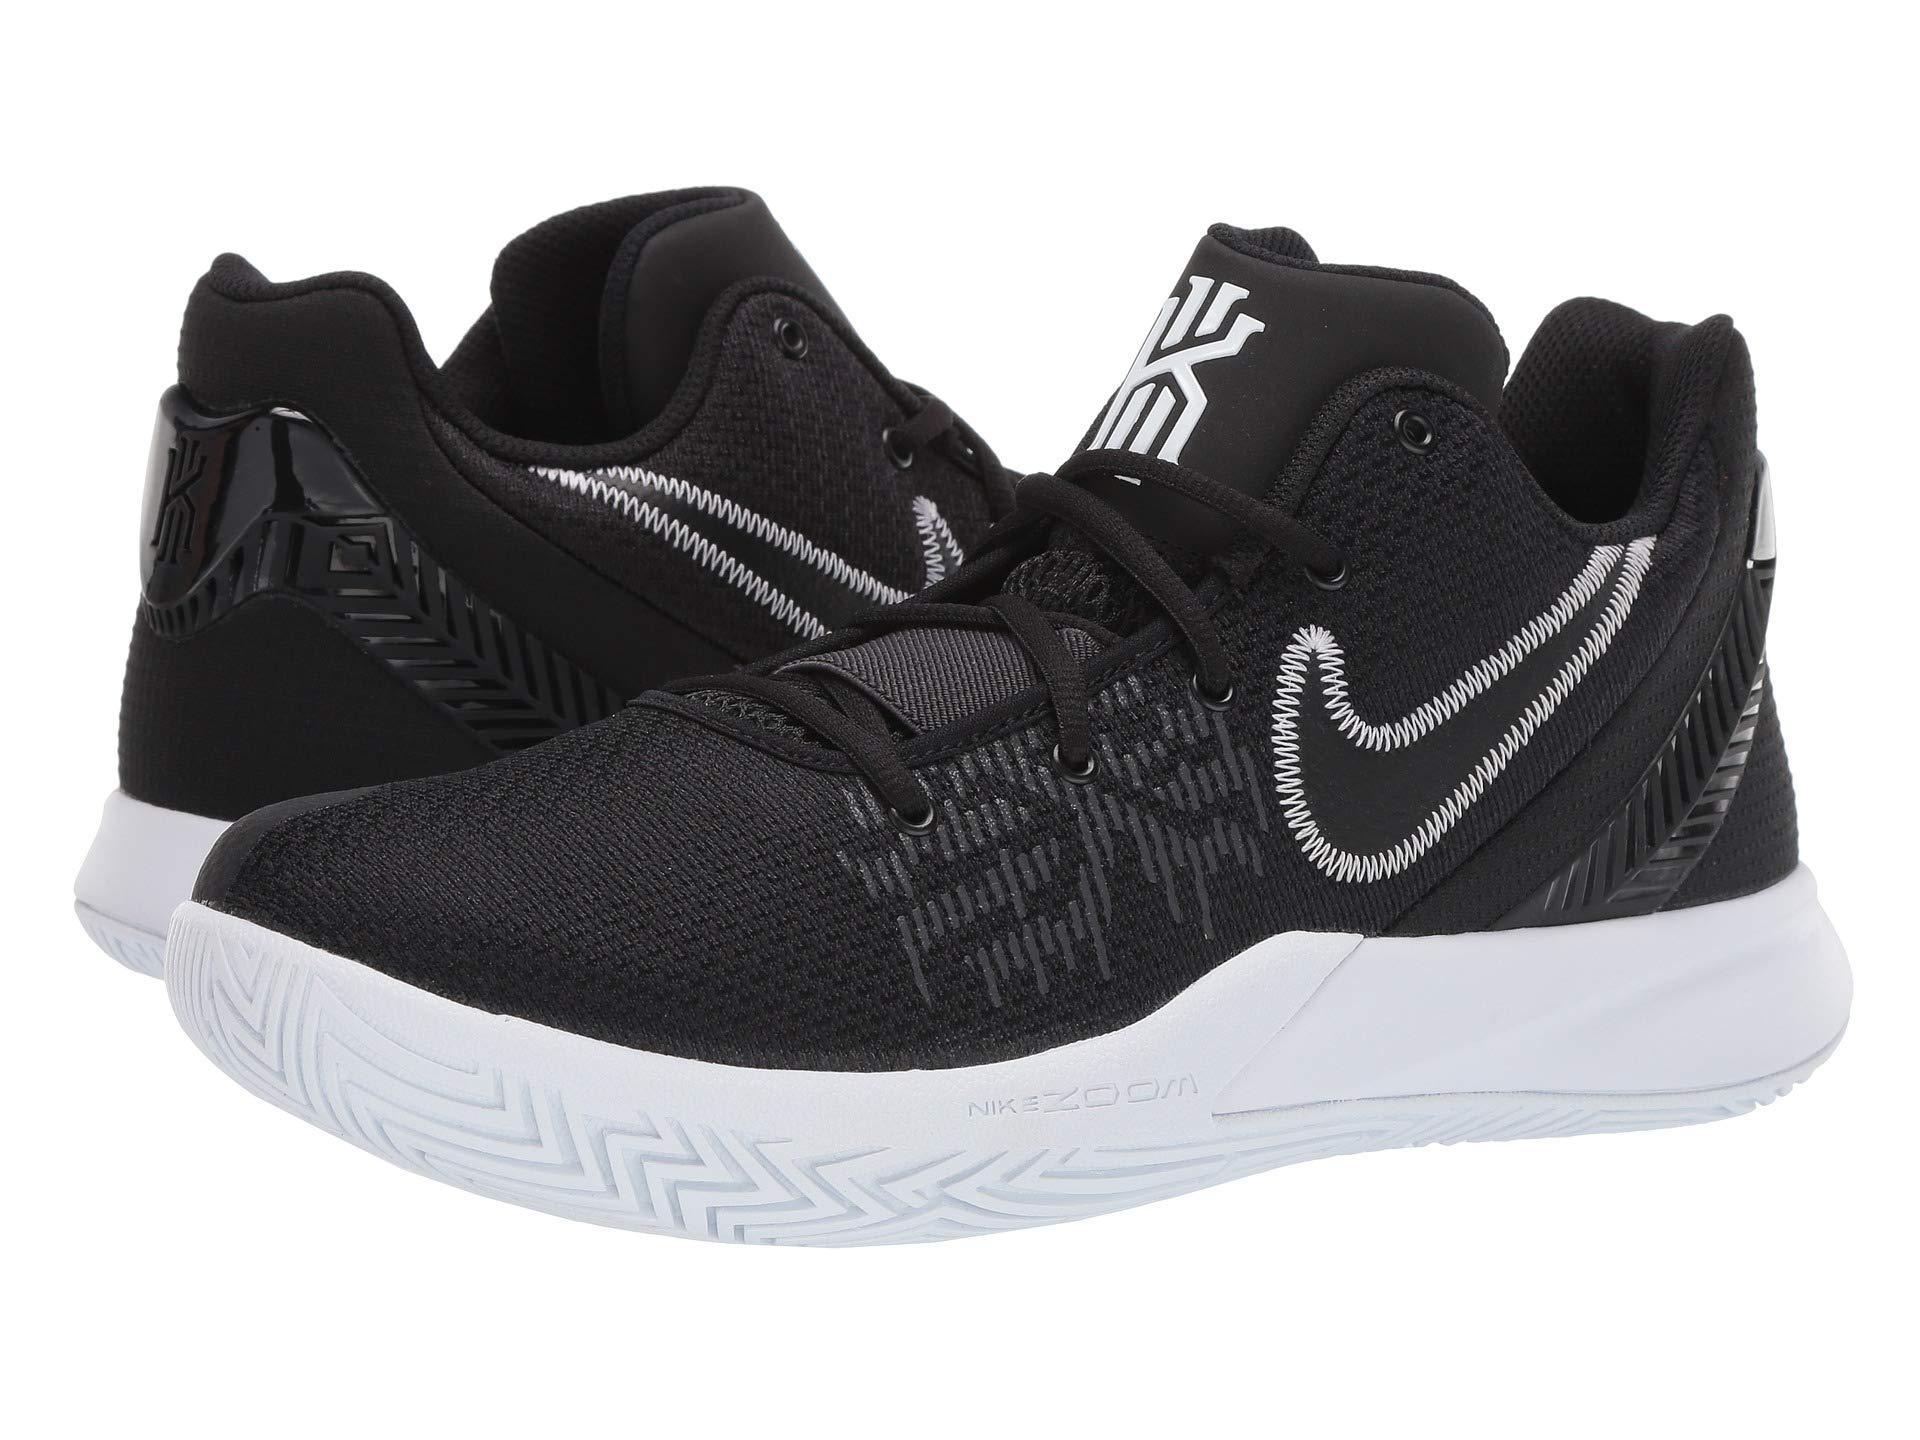 sports shoes 2cc33 46251 Nike. Kyrie Flytrap Ii (blackwhiteuniversity Redanthracite) ...